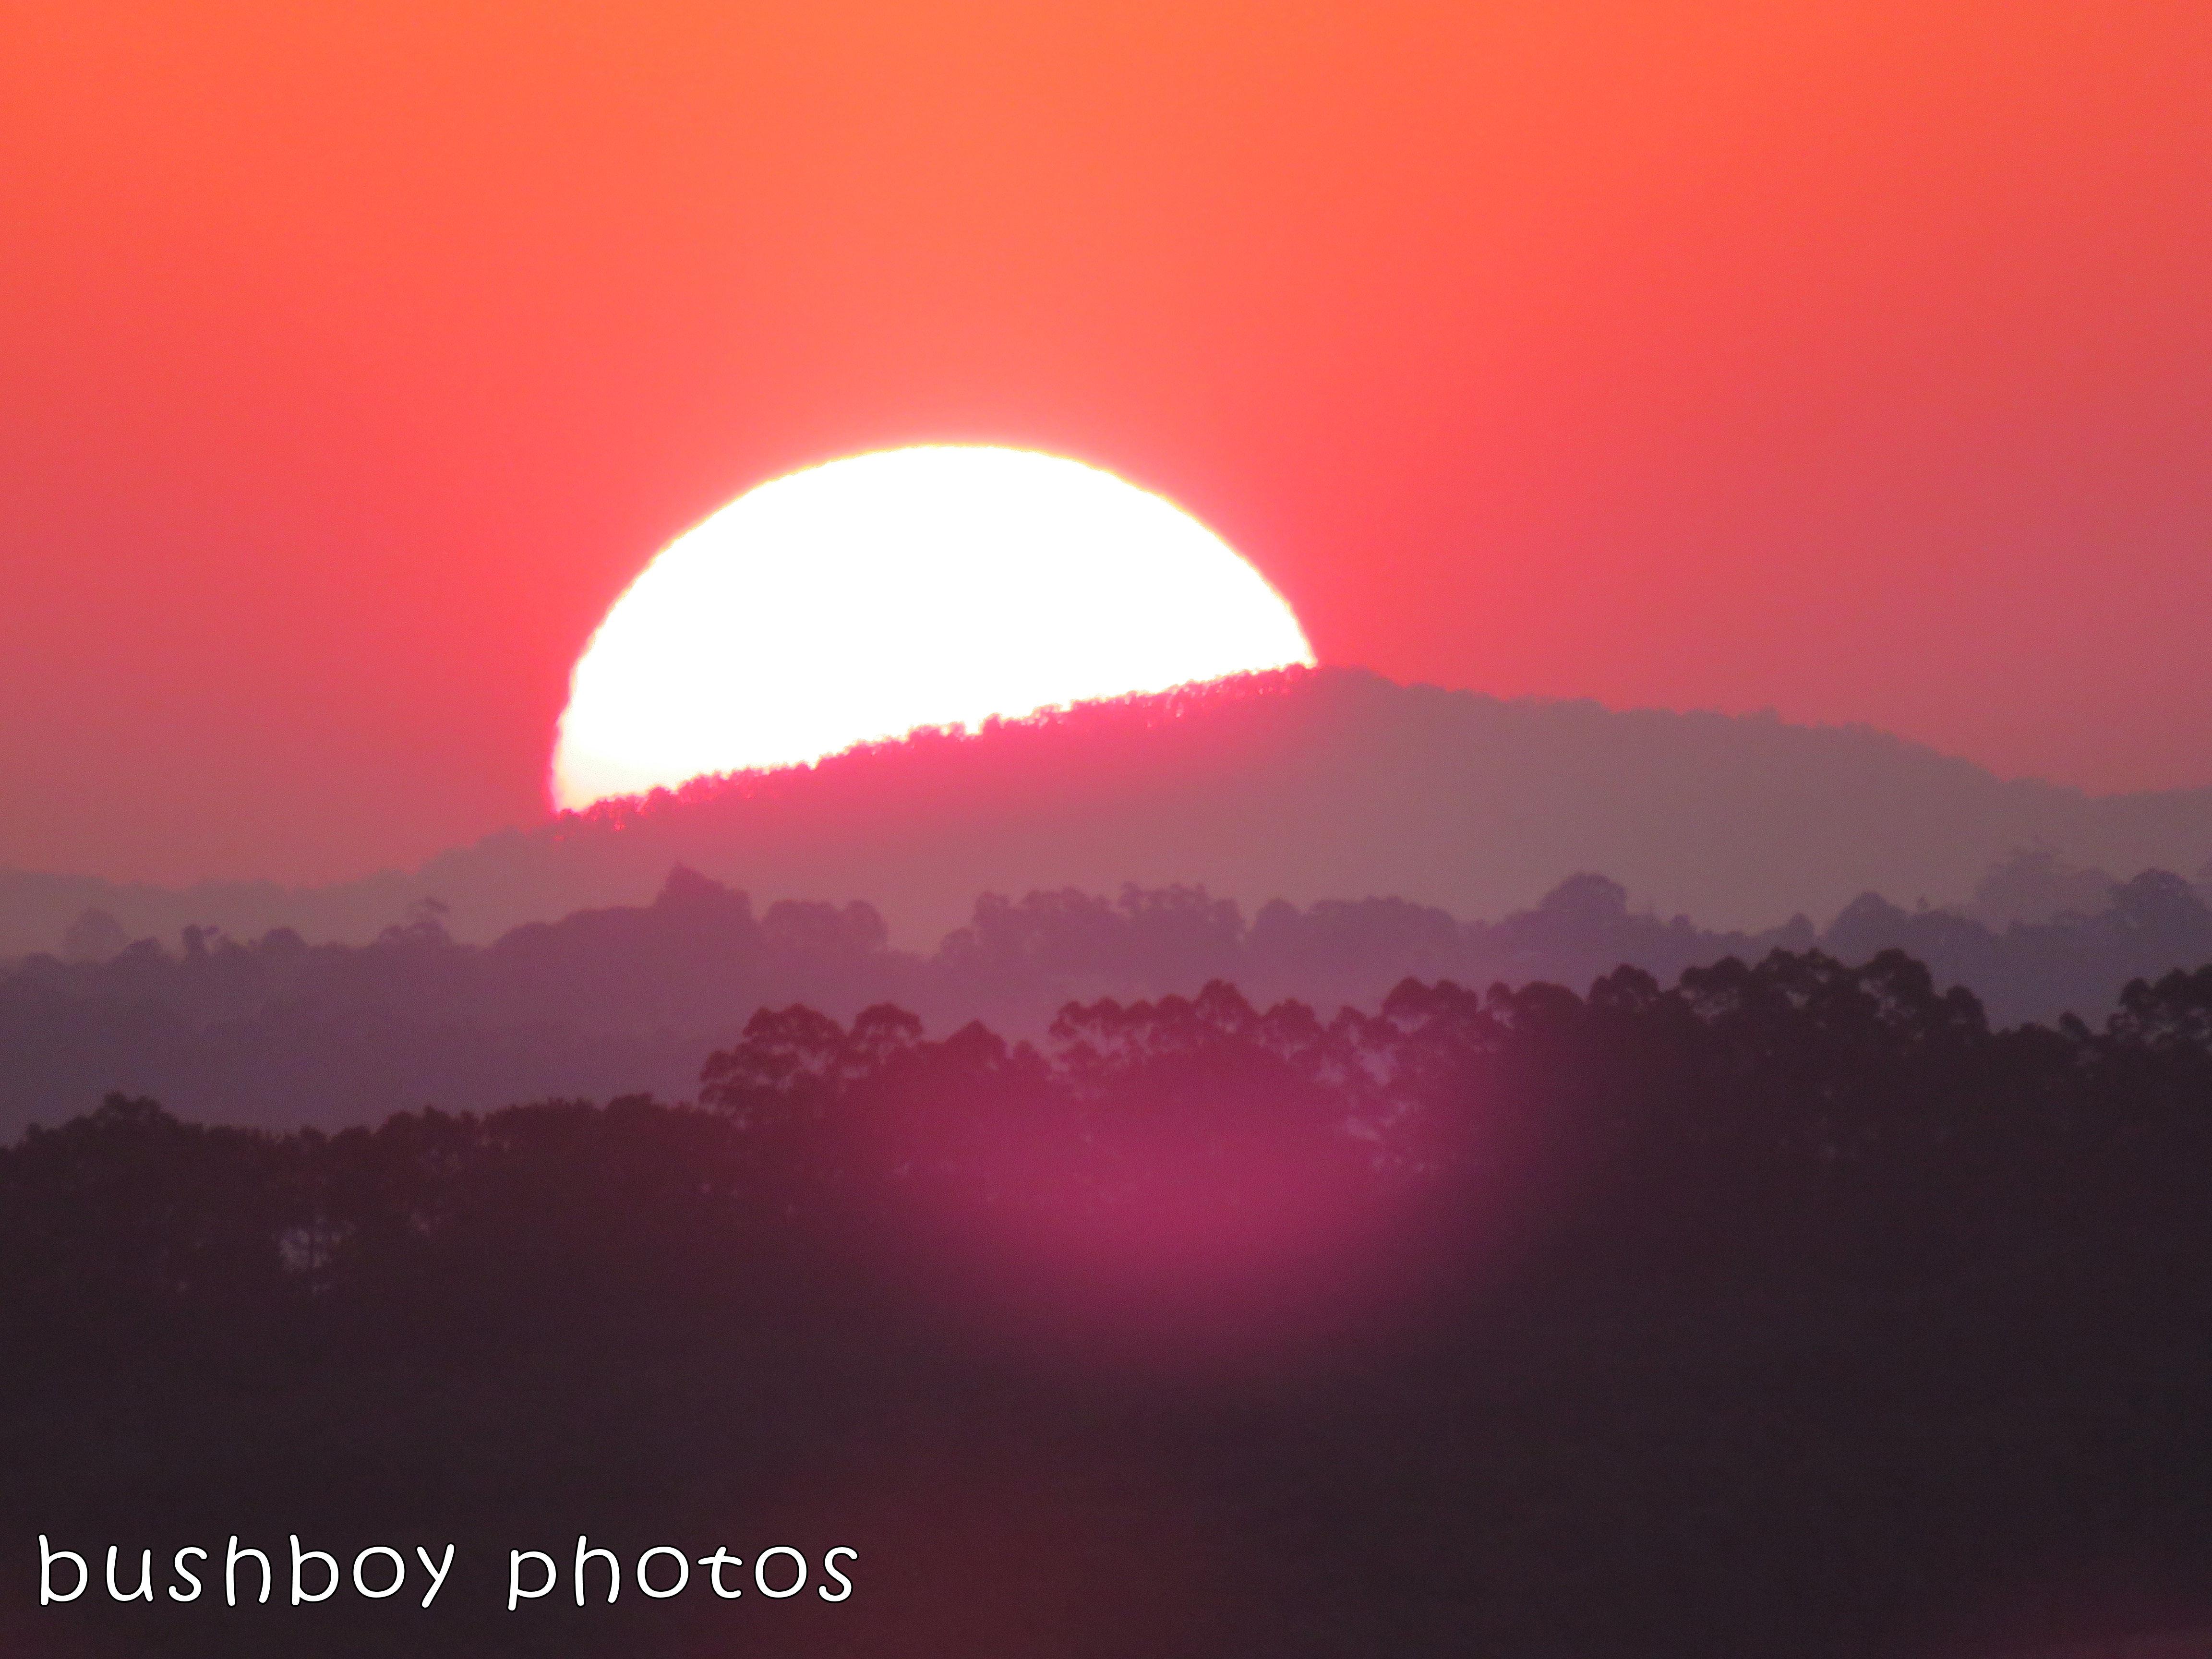 sunset_close_named_binna burra_august 2017